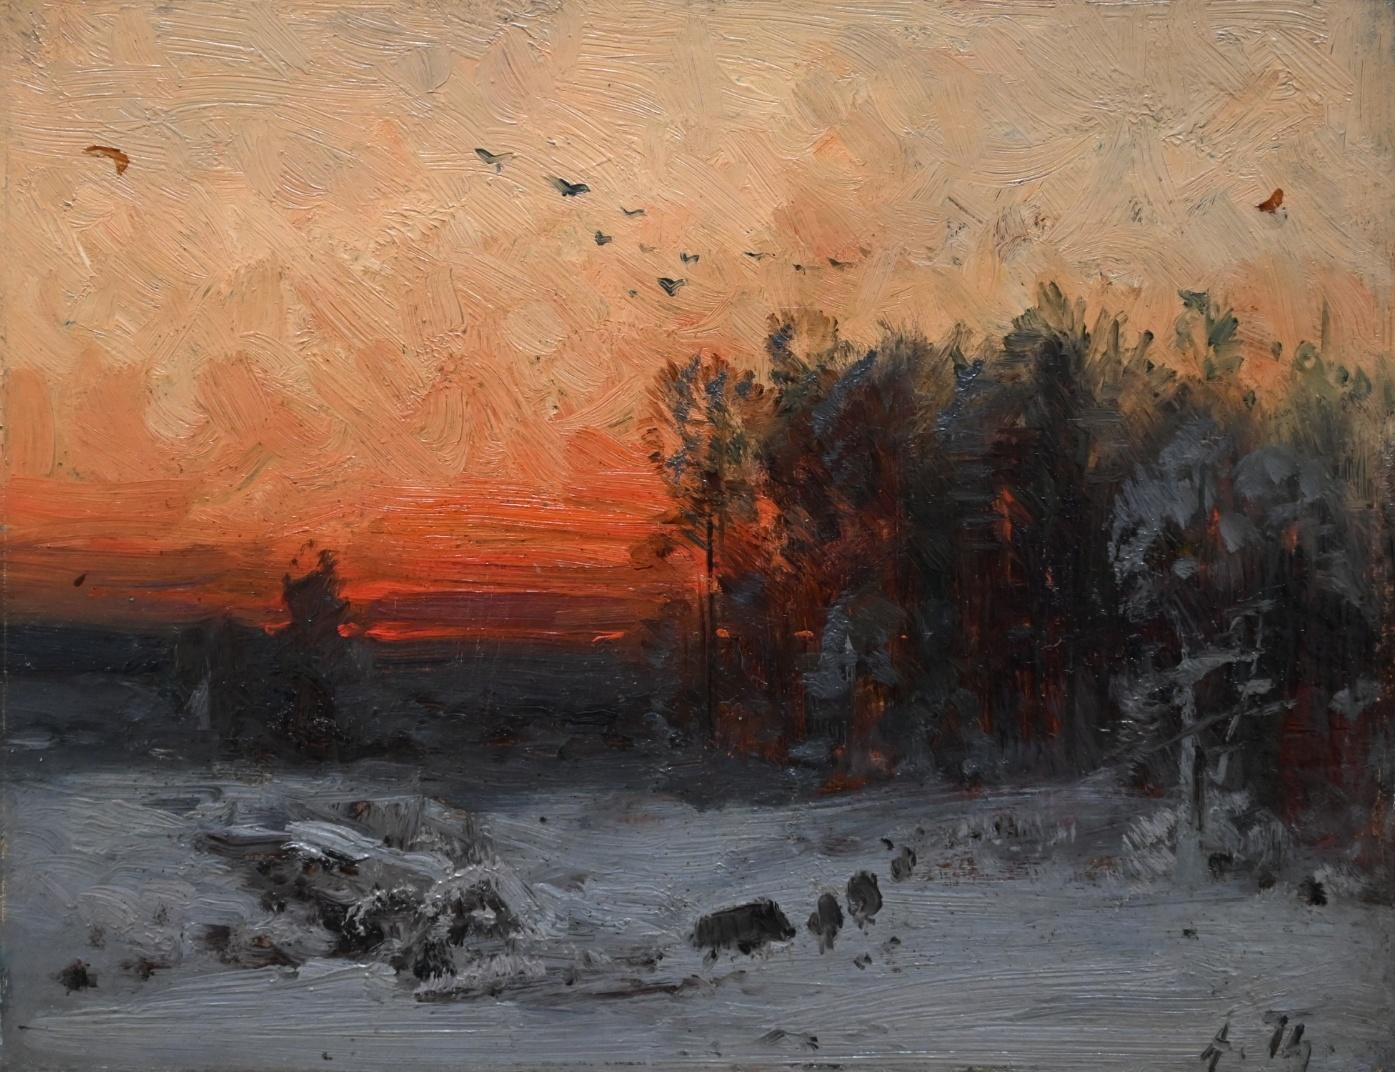 Arthur Thiele (1841 - 1919) » Öl-Gemälde Impressionismus Winter Wald Landschaft